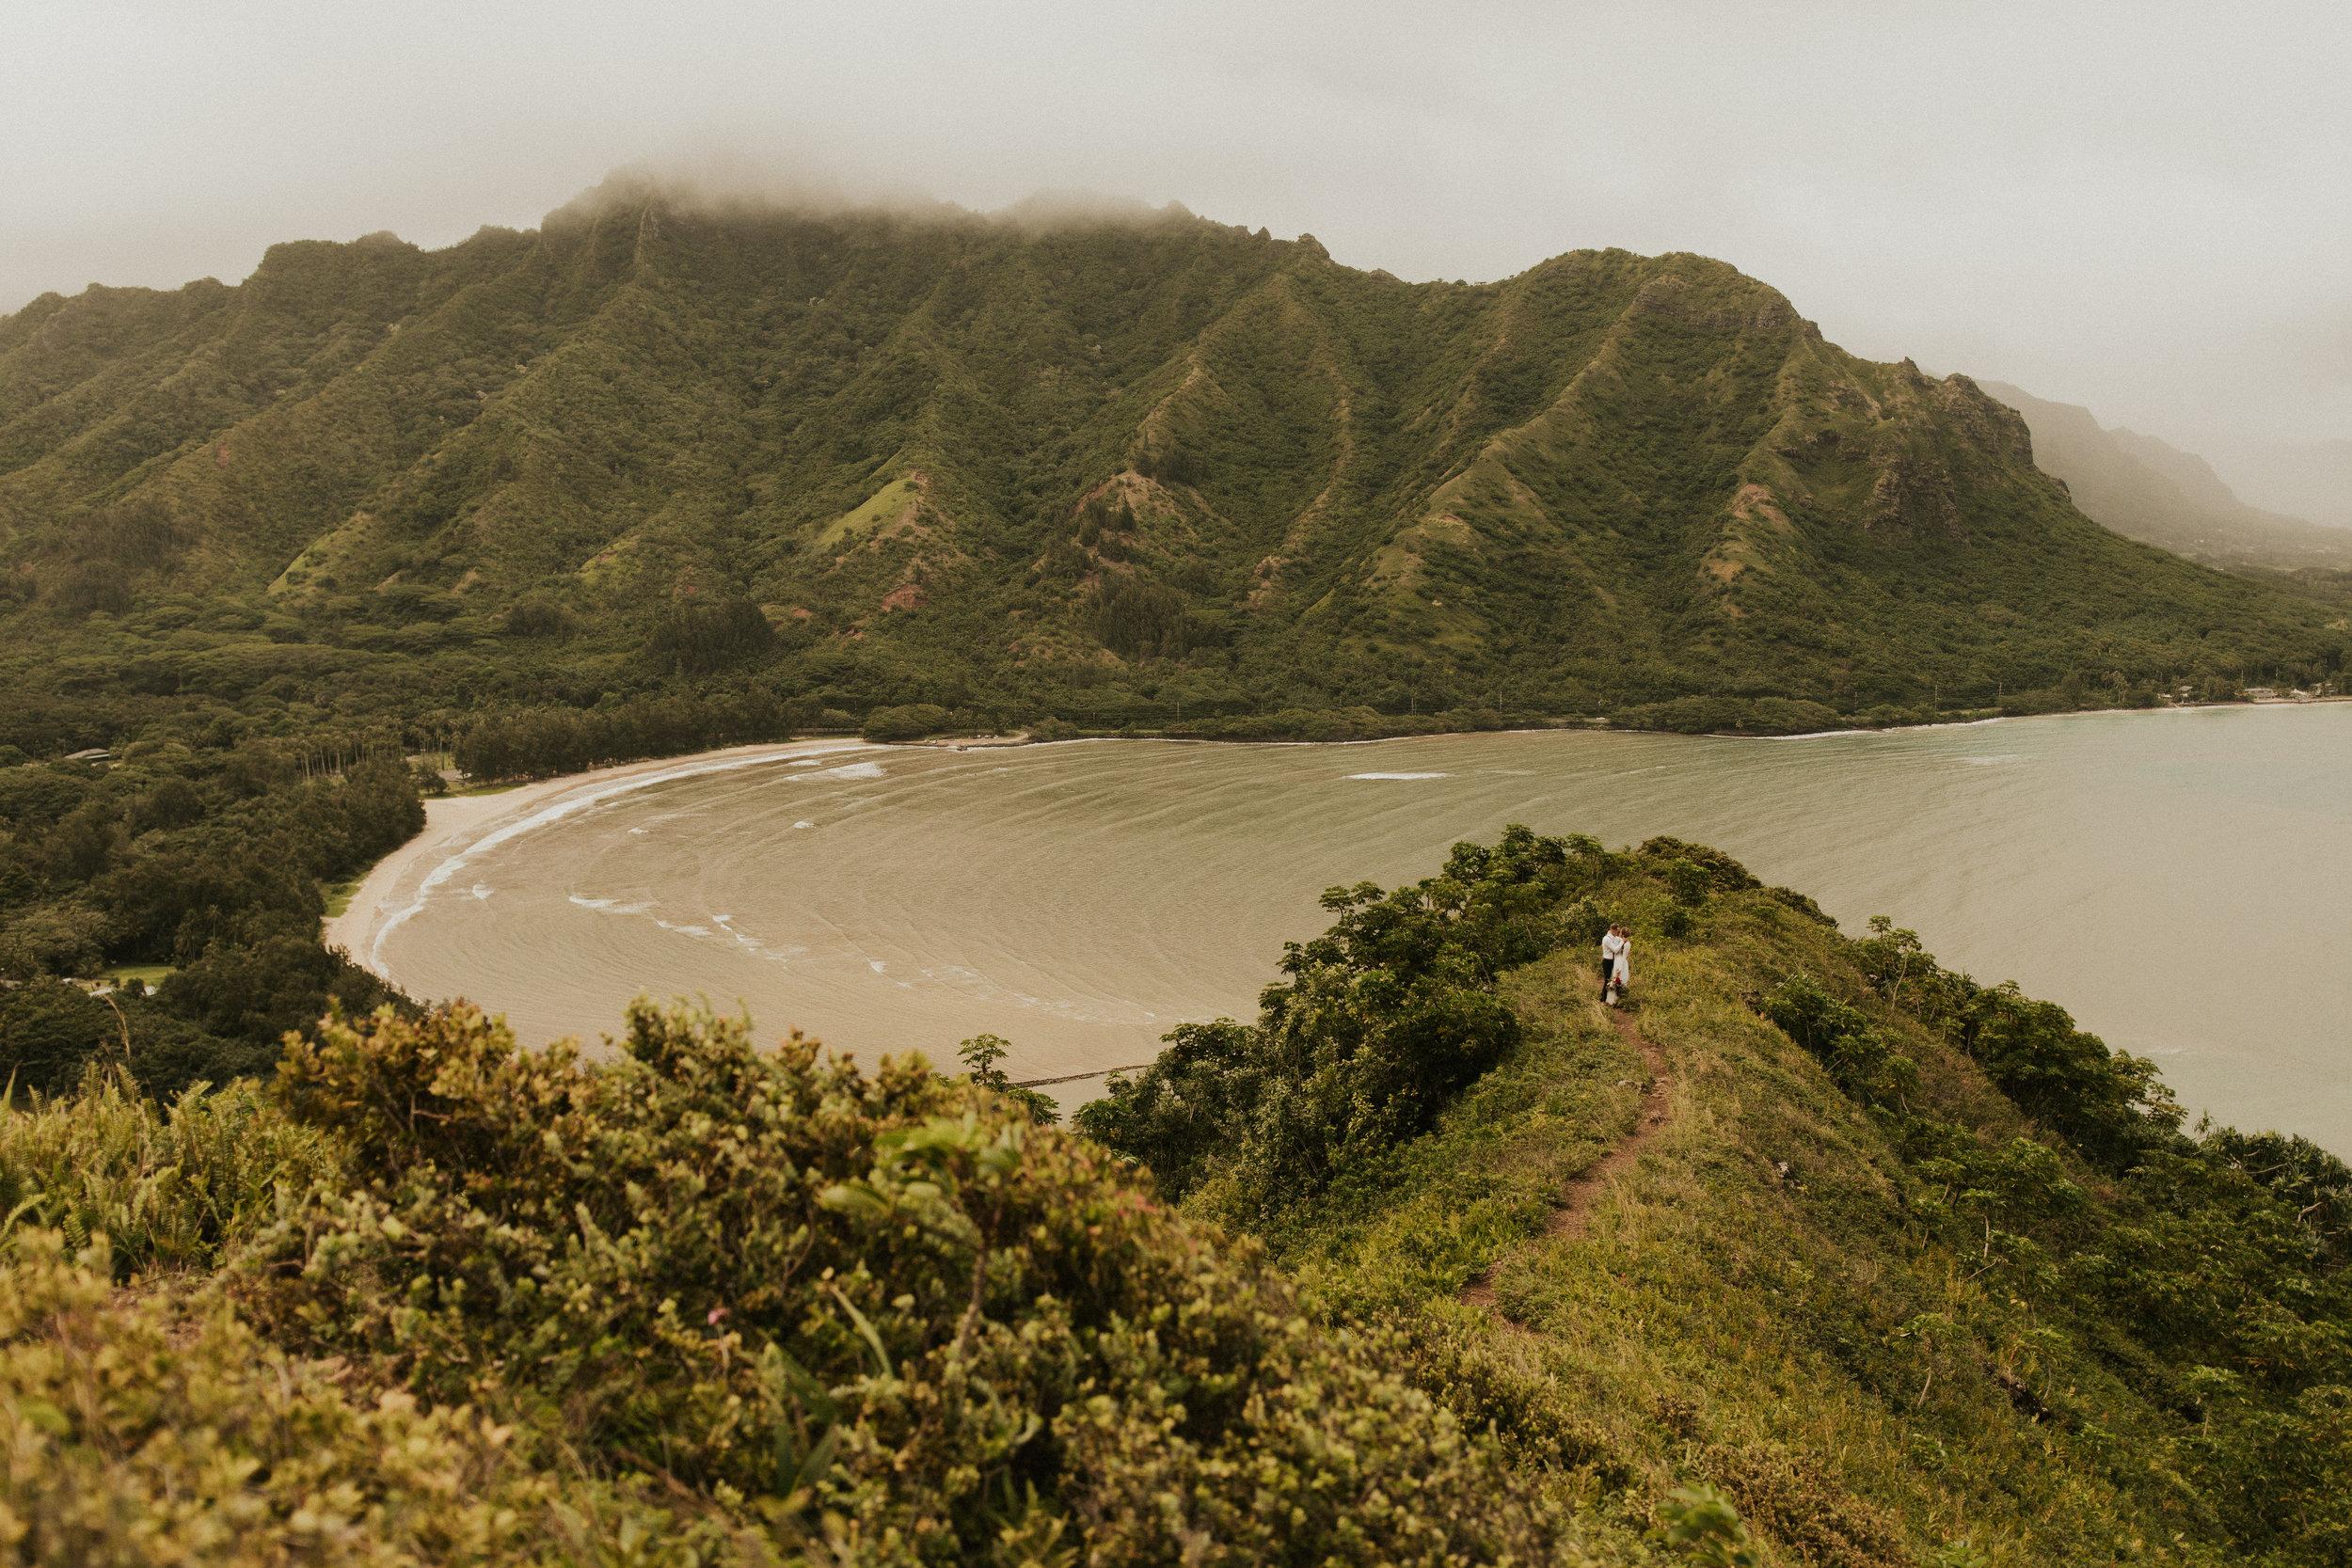 the-mclachlans-destination-elopement-photographers-mountain-hike-sena-eric-104.jpg